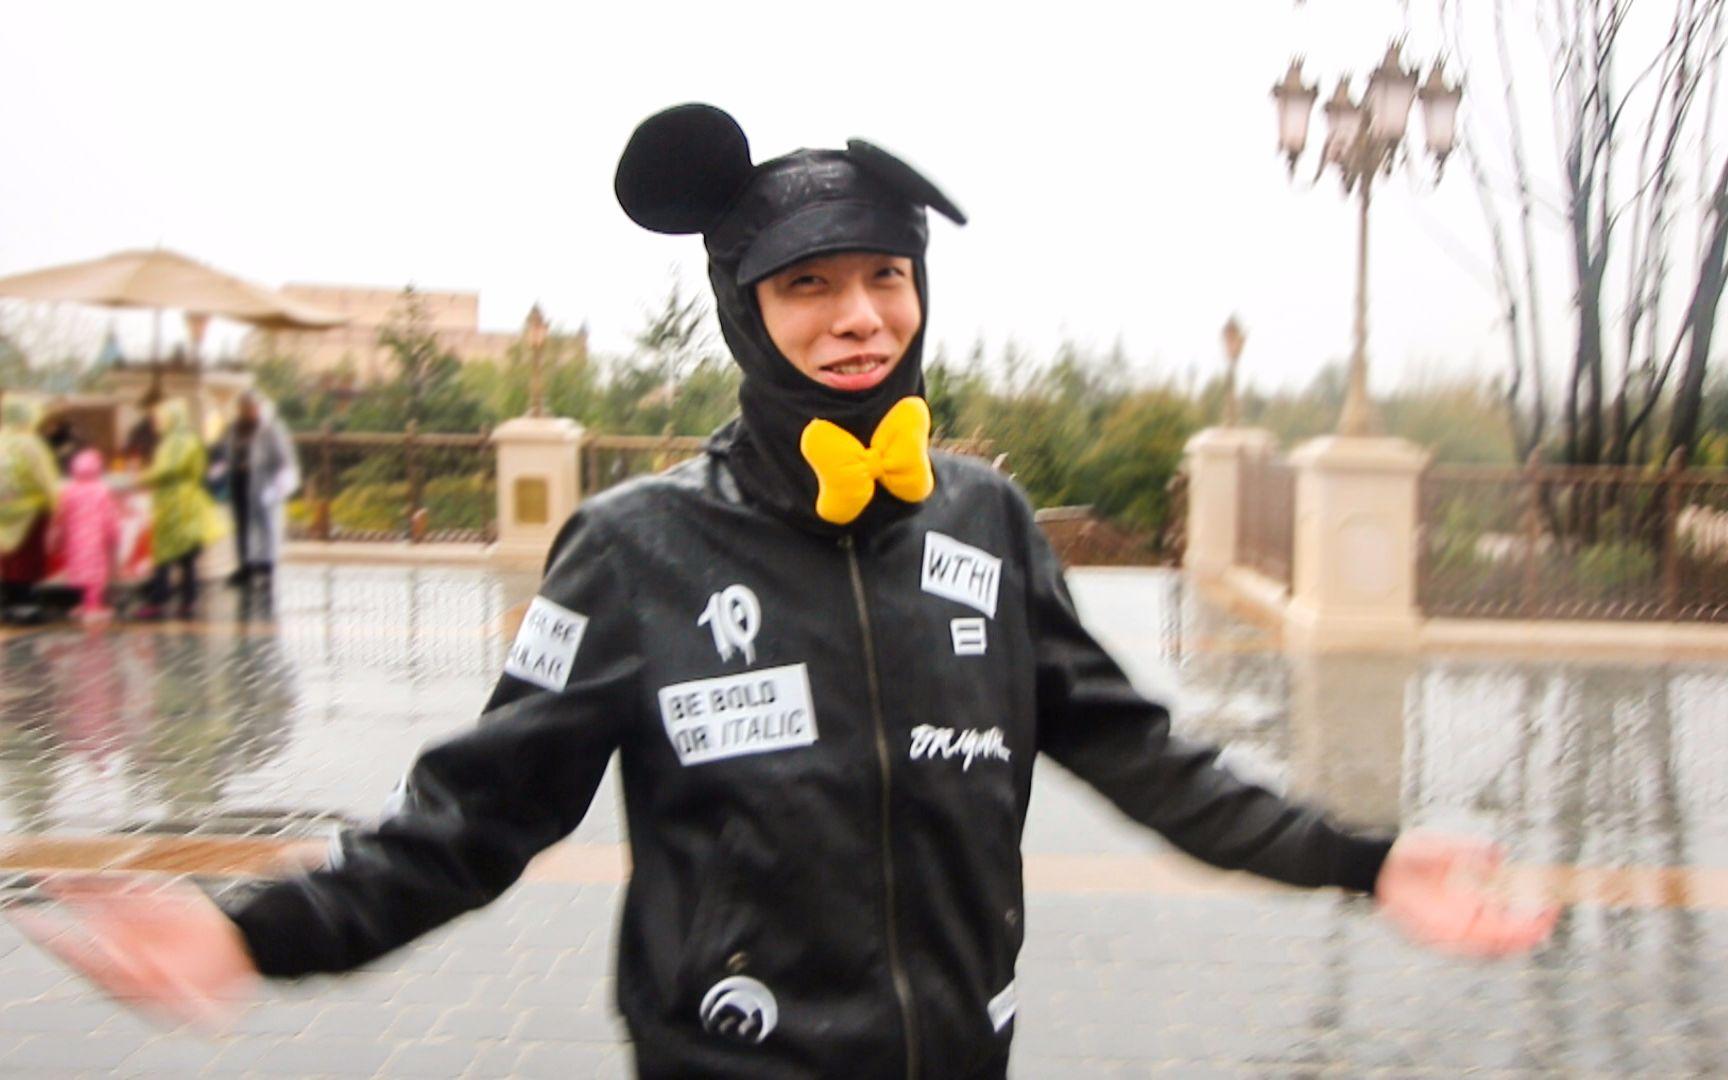 在迪士尼被围观(Vlog)